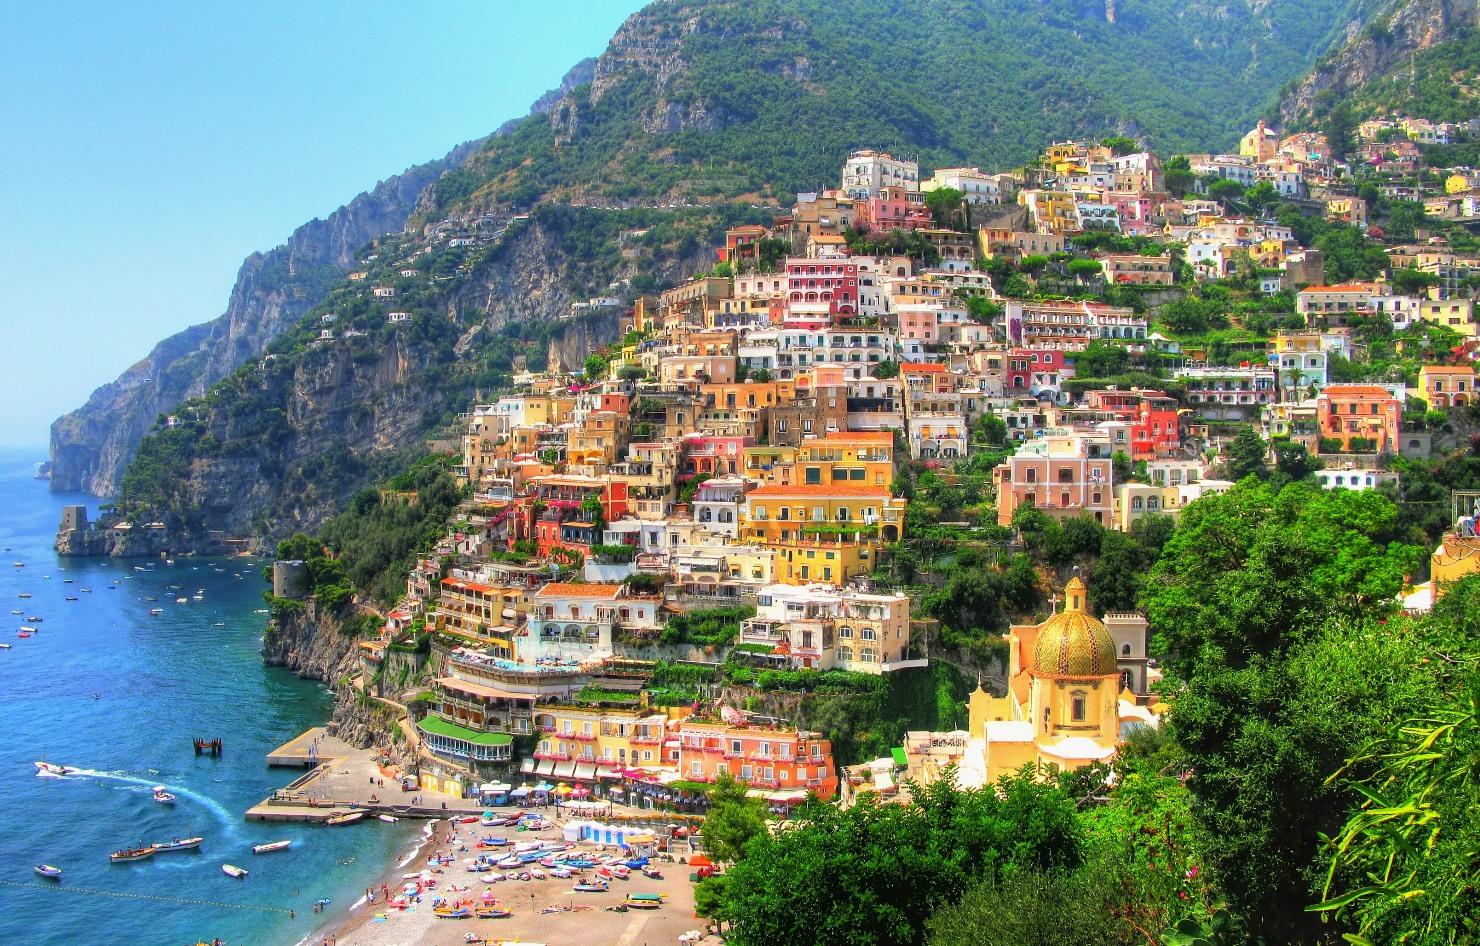 http://www.prasannaholidays.com/wp-content/uploads/2014/05/amalfi-coast-sorrento-italy.jpg